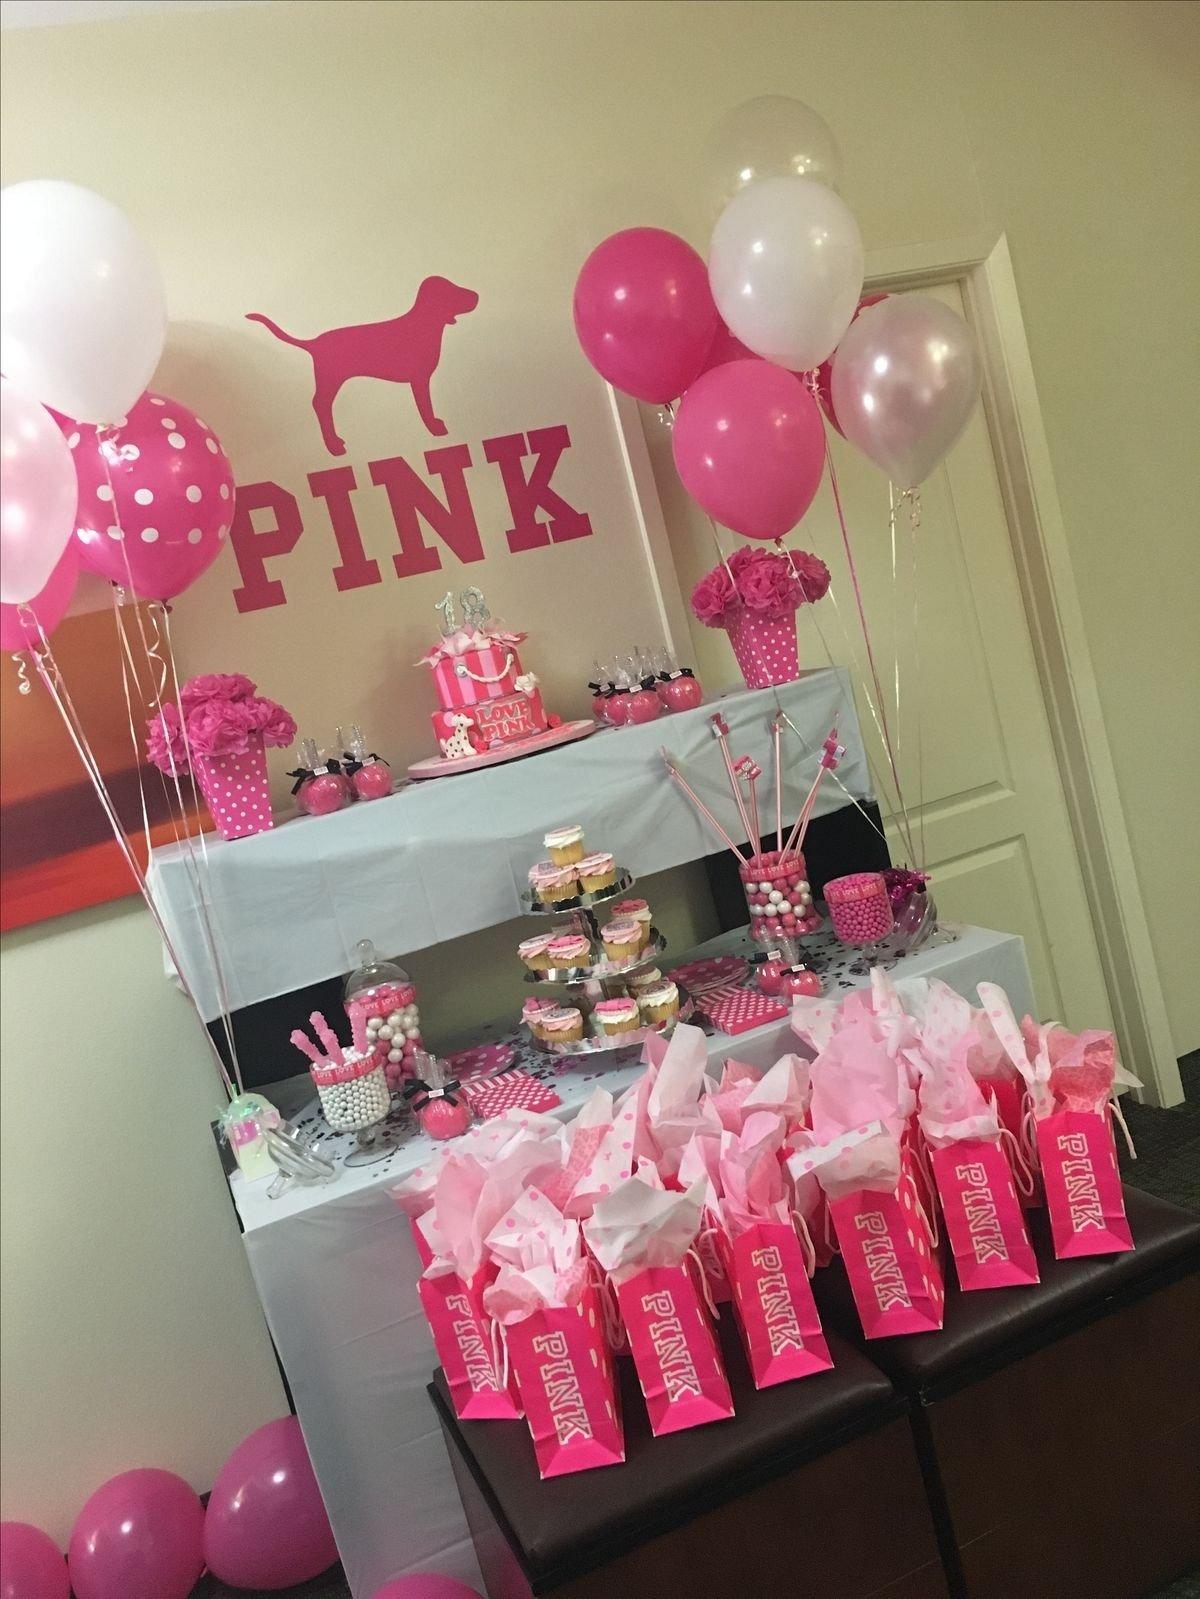 10 Lovable 13 Year Old Girl Birthday Party Ideas themes birthday good ideas for a 13 year old birthday party girl 6